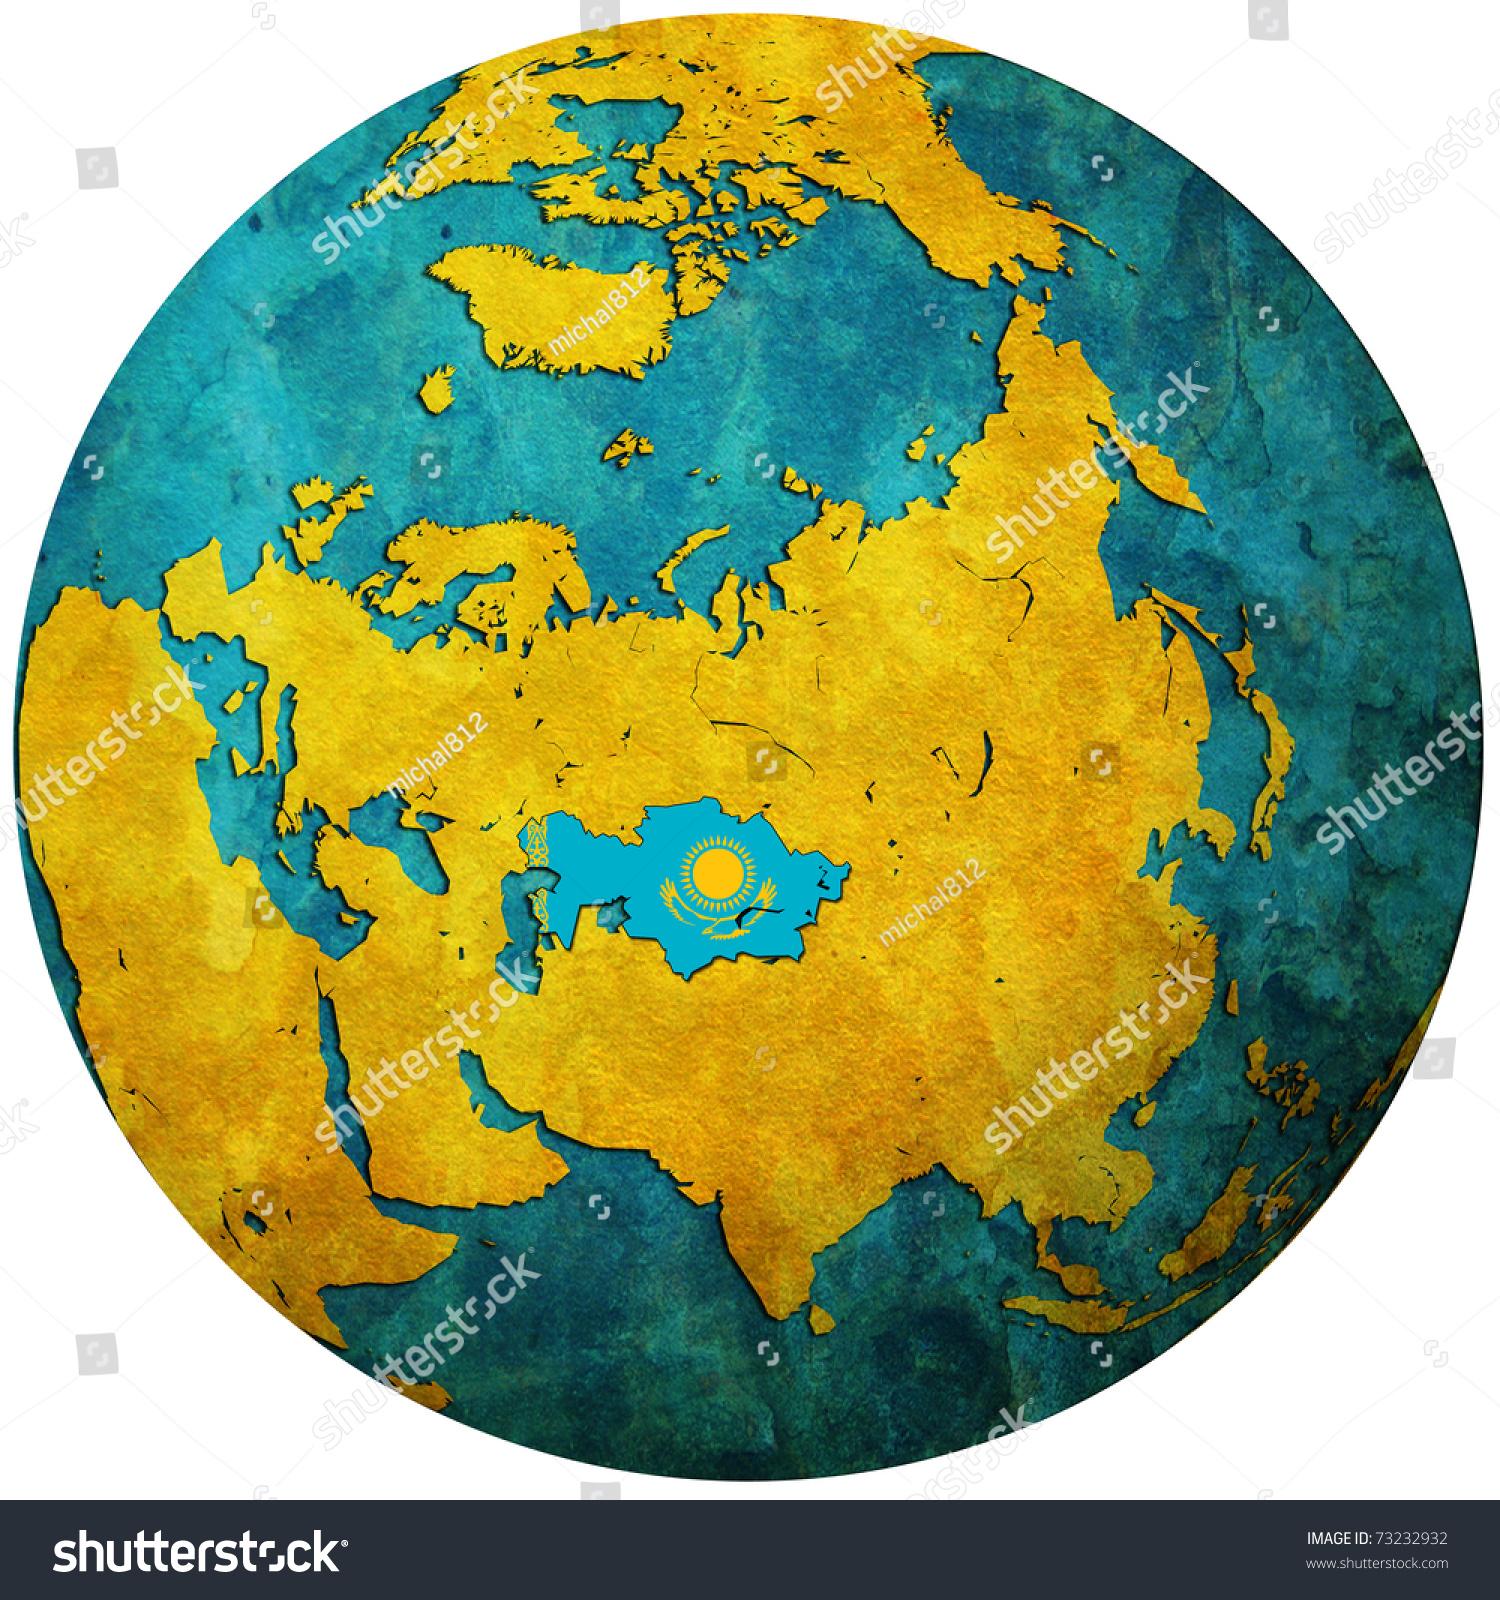 Kazakhstan Territory With Flag On Map Of Globe Stock Photo ...